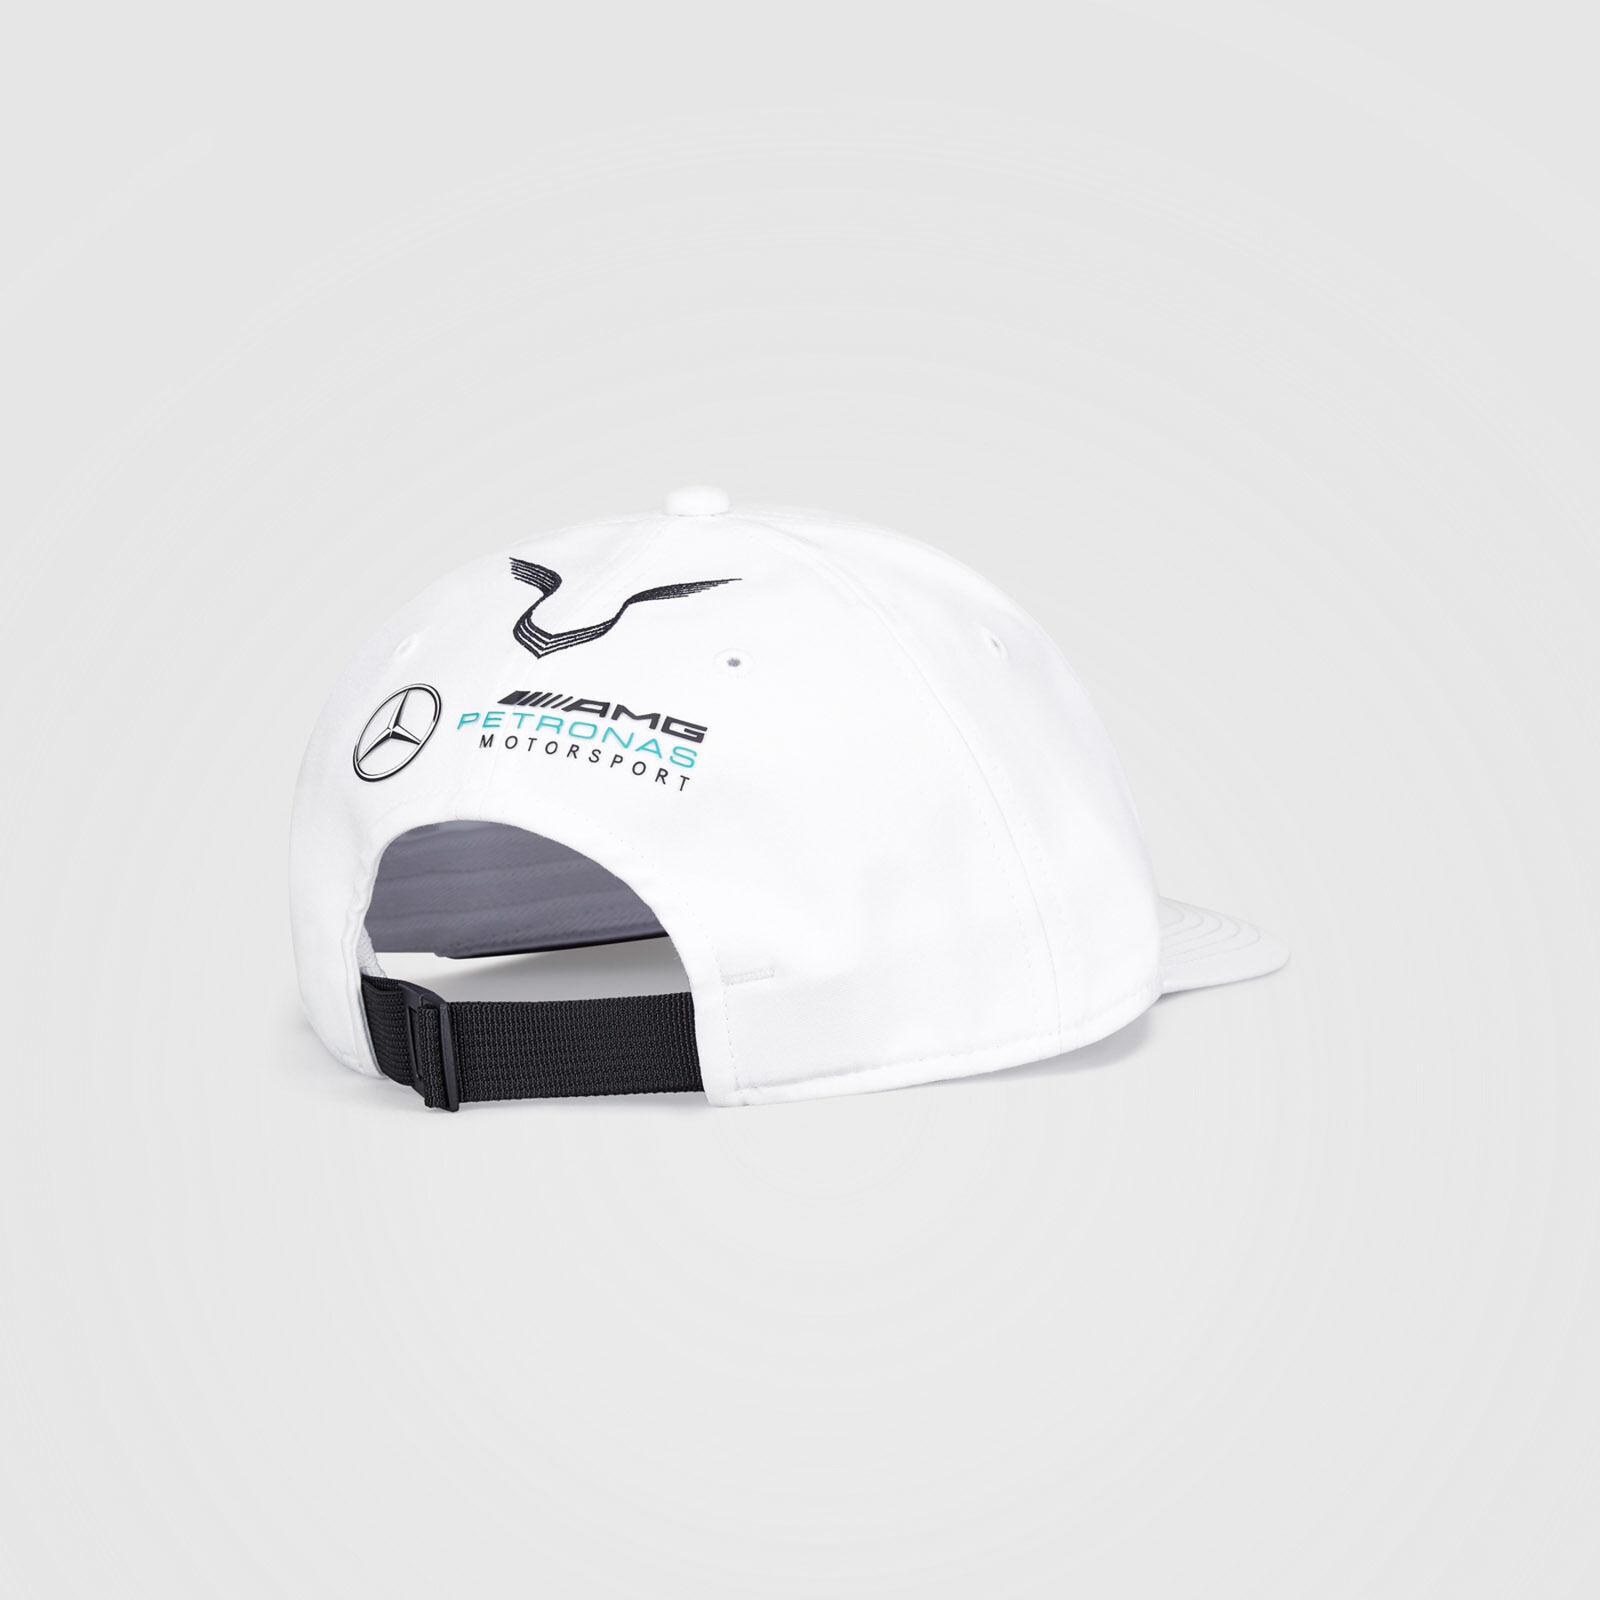 Mercedes Pet Hamilton (Flat) 2021 - Wit